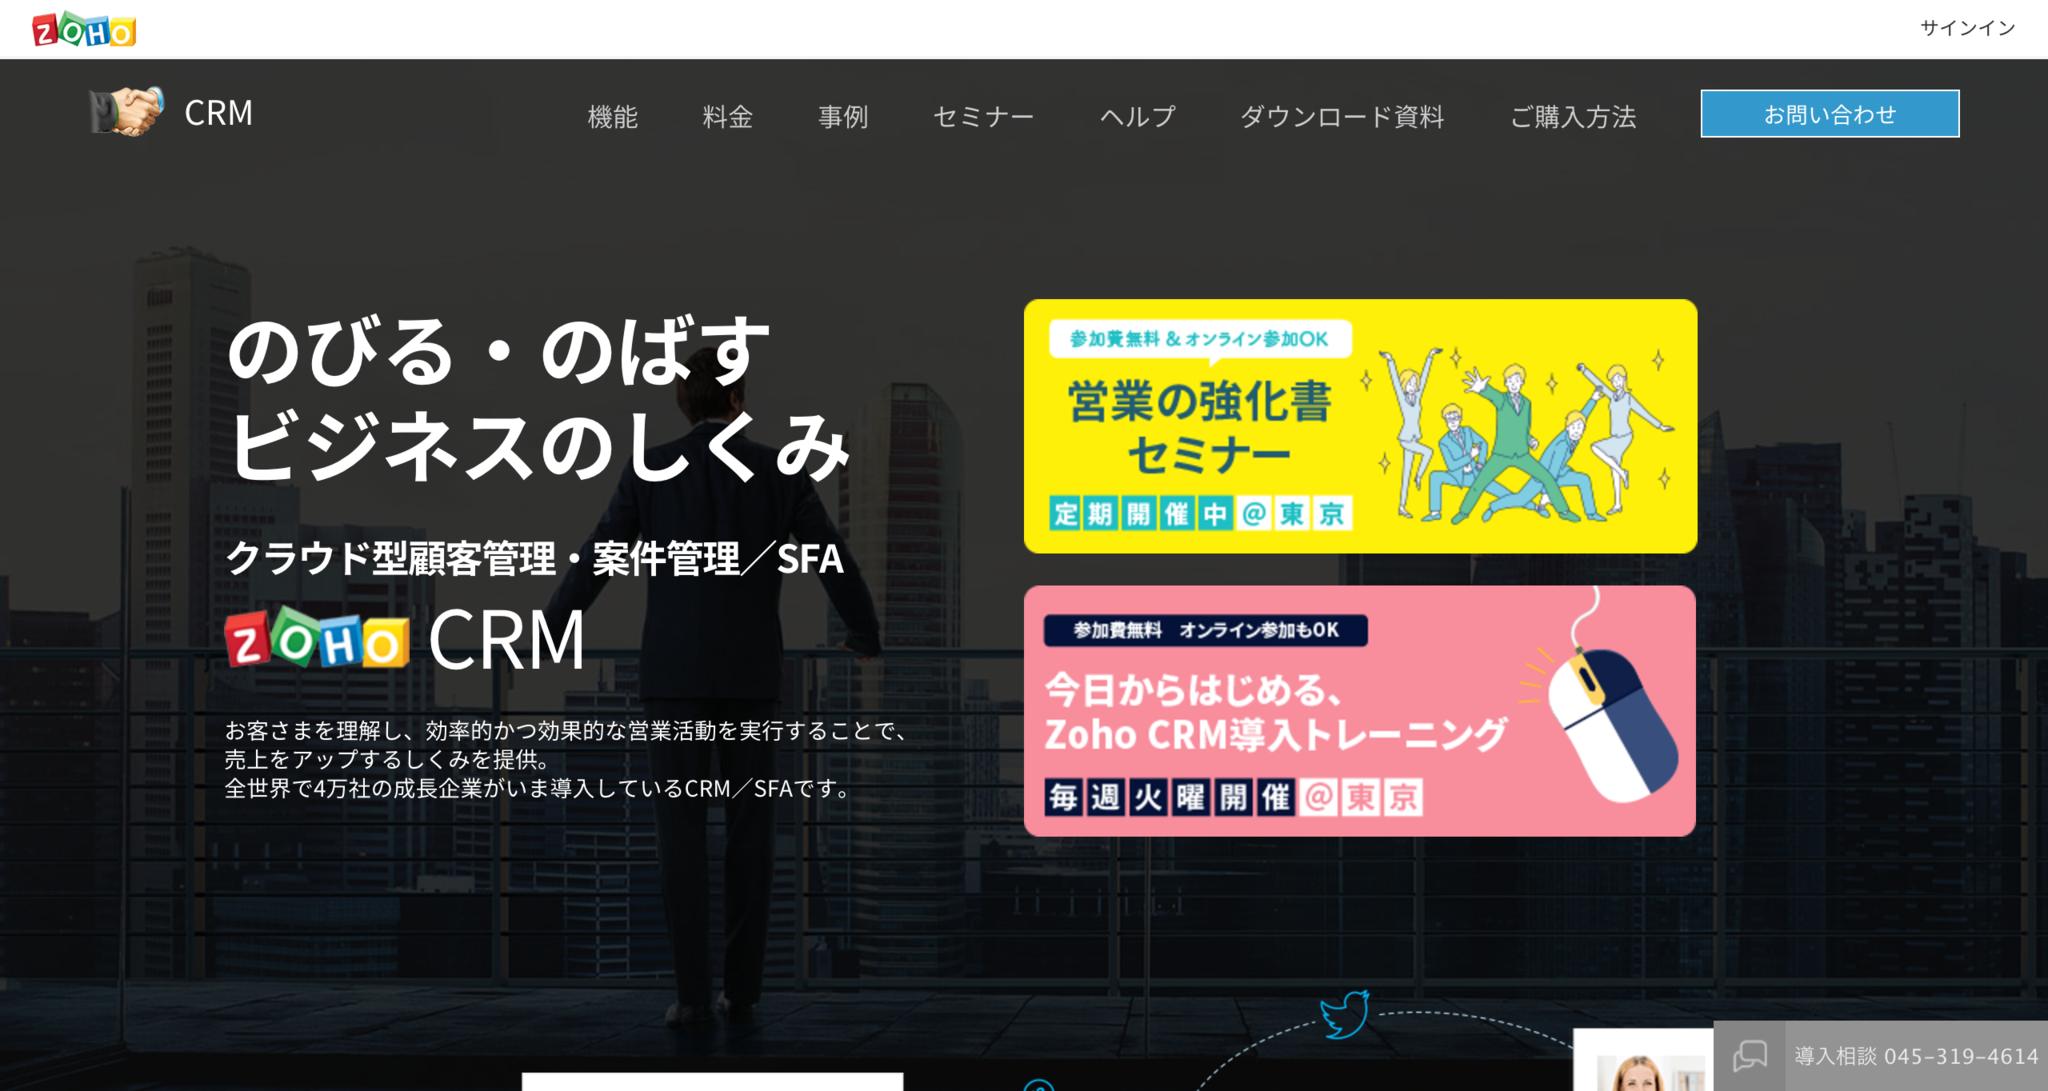 Zoho_CRM_–_クラウド型顧客管理・案件管理システム/SFA.png